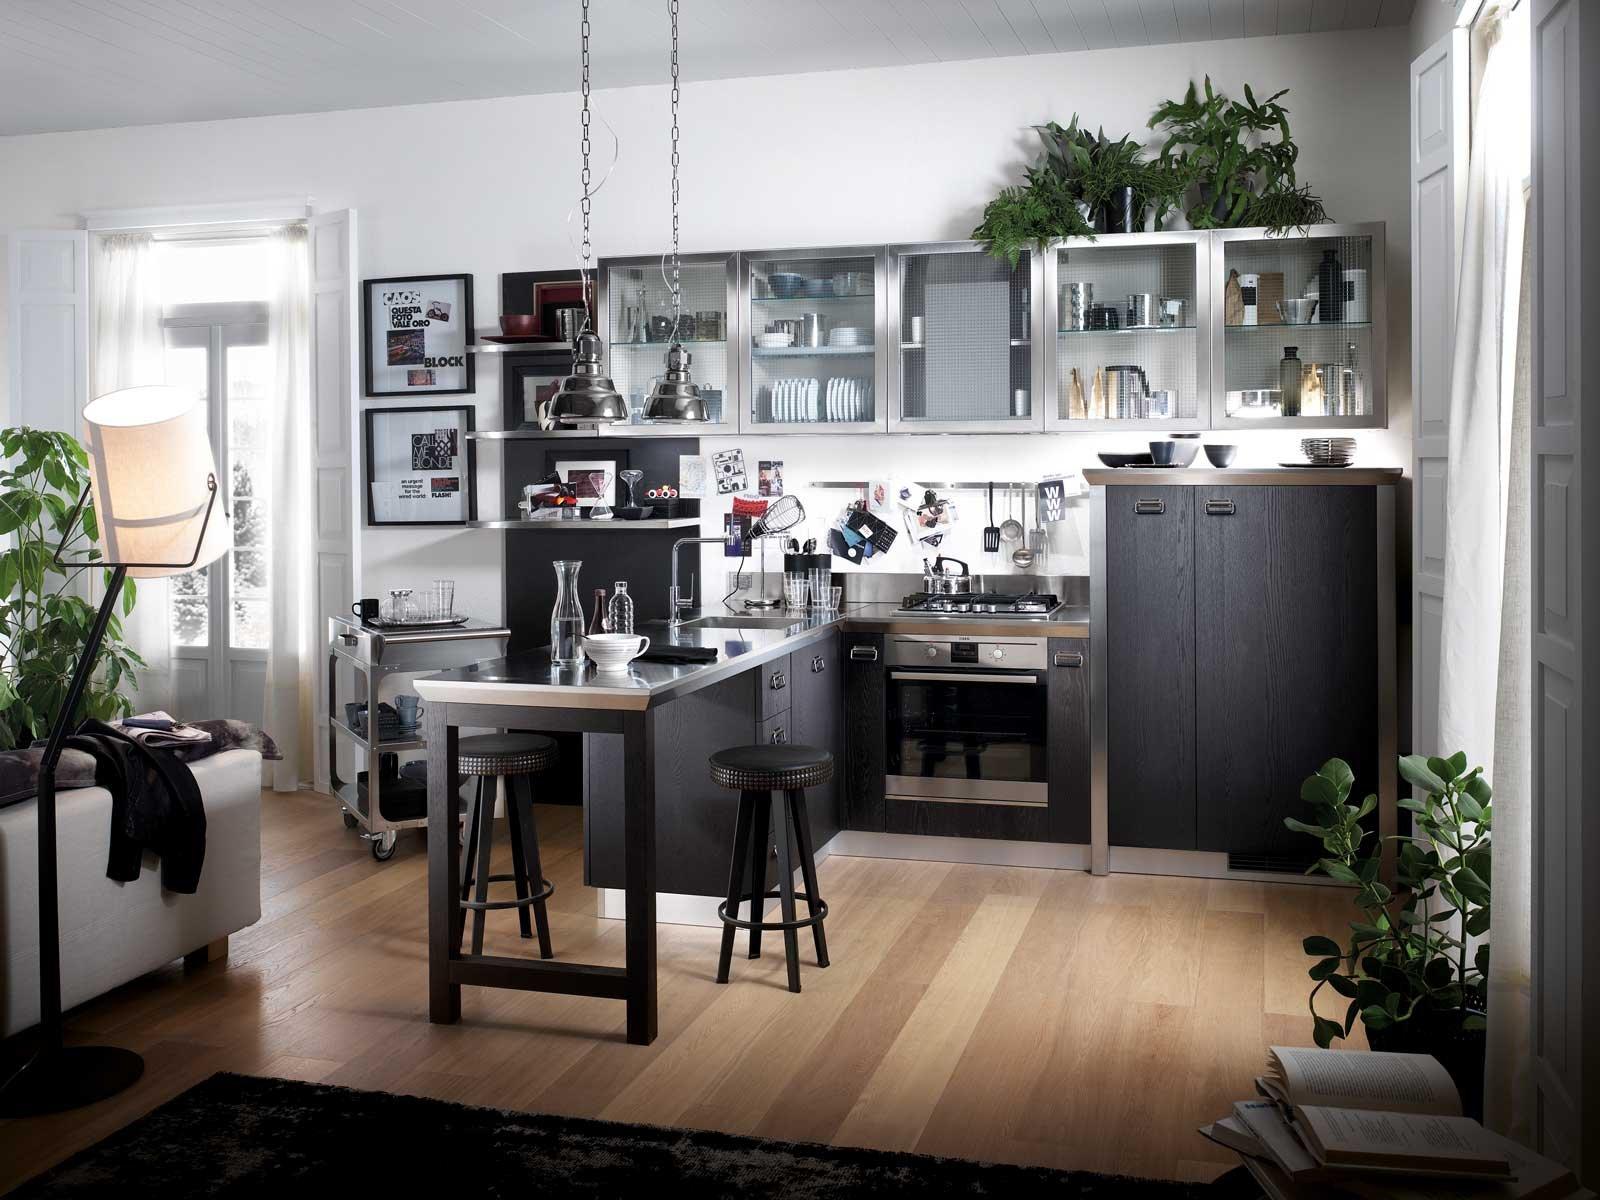 Best Cucina Ad Isola Ideas - Embercreative.us - embercreative.us